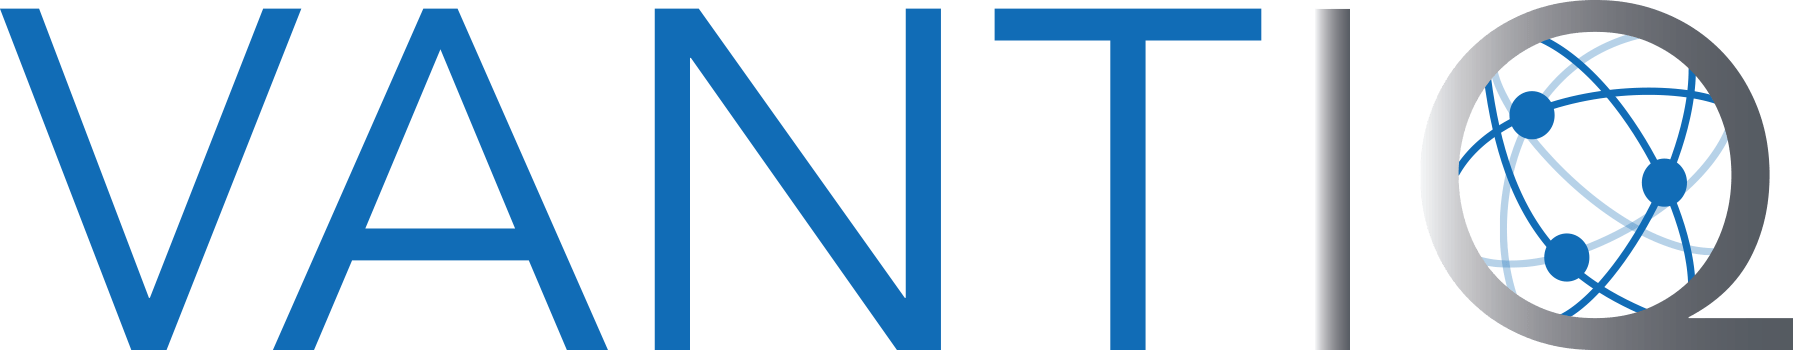 vantiq-logo-900x175-2x